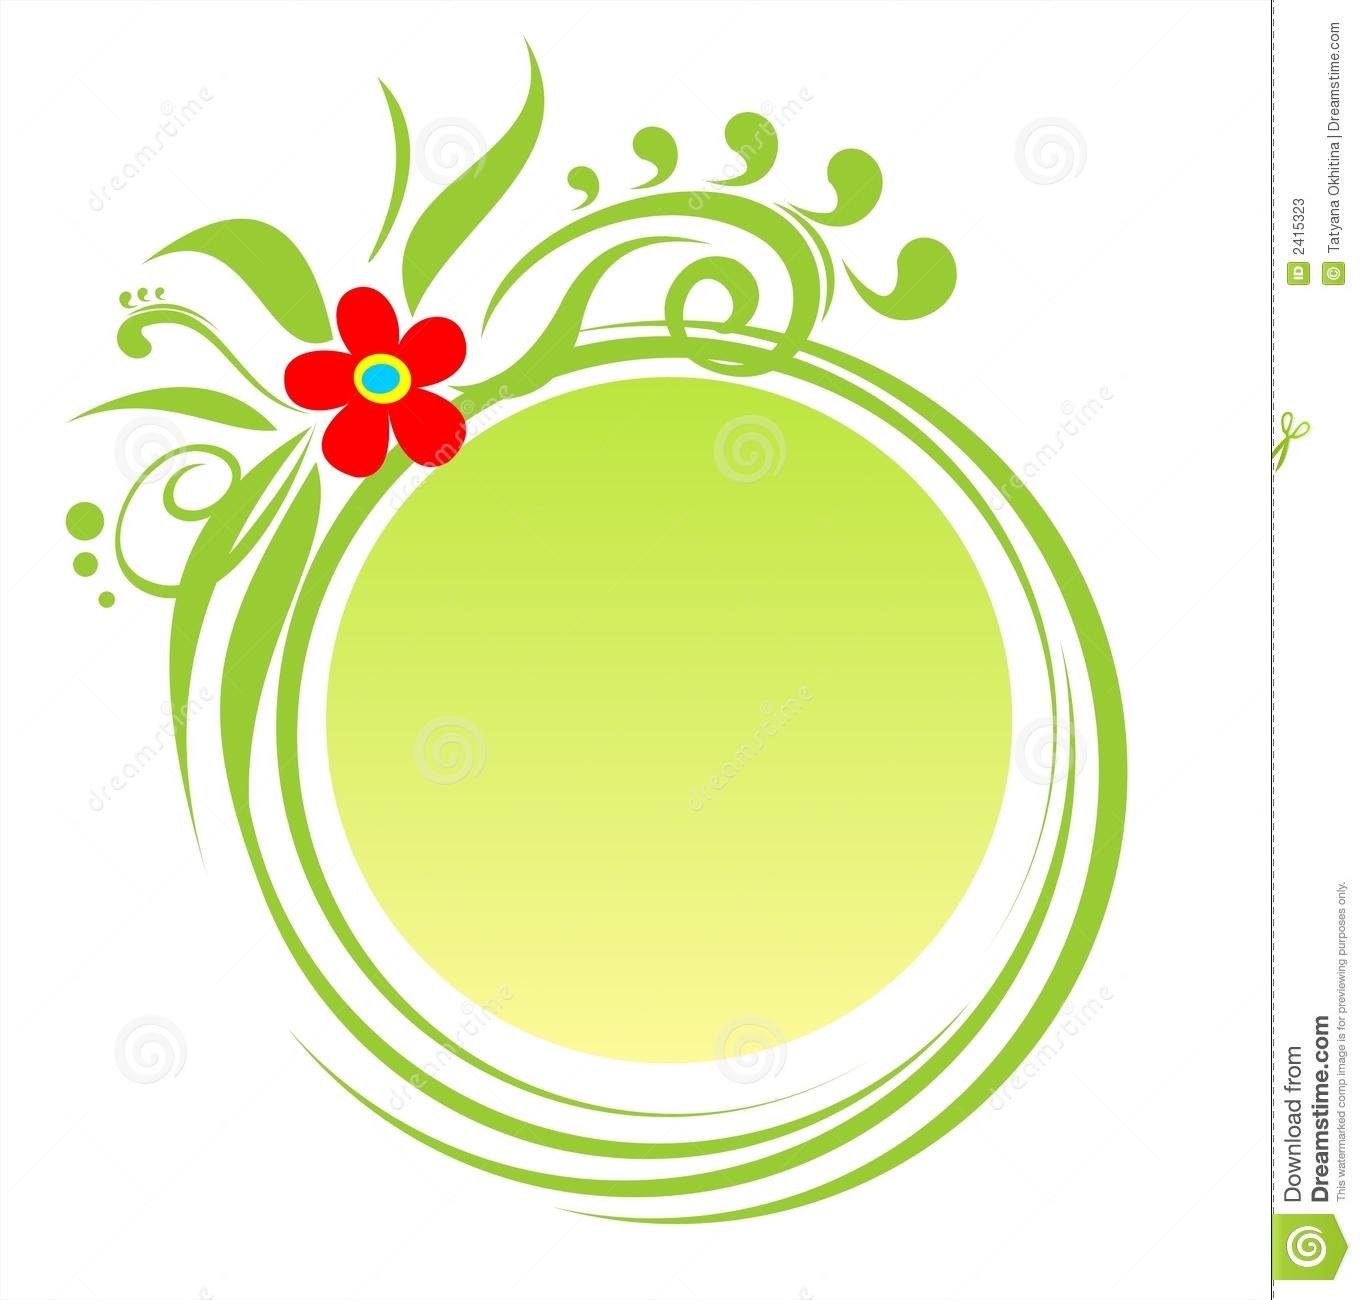 Green round clipart #17